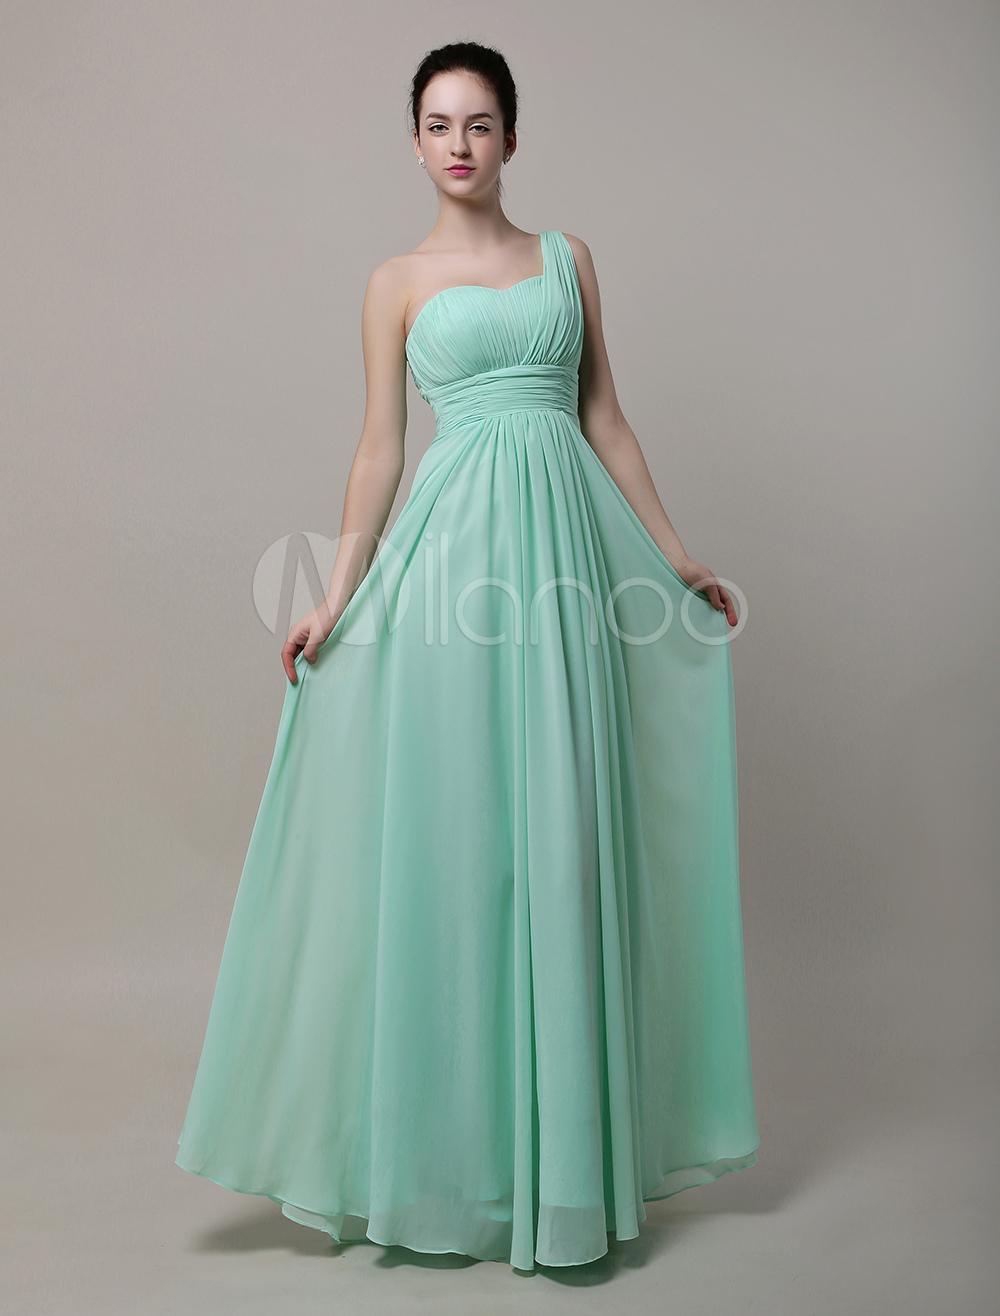 A-Line Sweatheart One Shoulder Floor-Length Chiffon Bridesmaid Dress